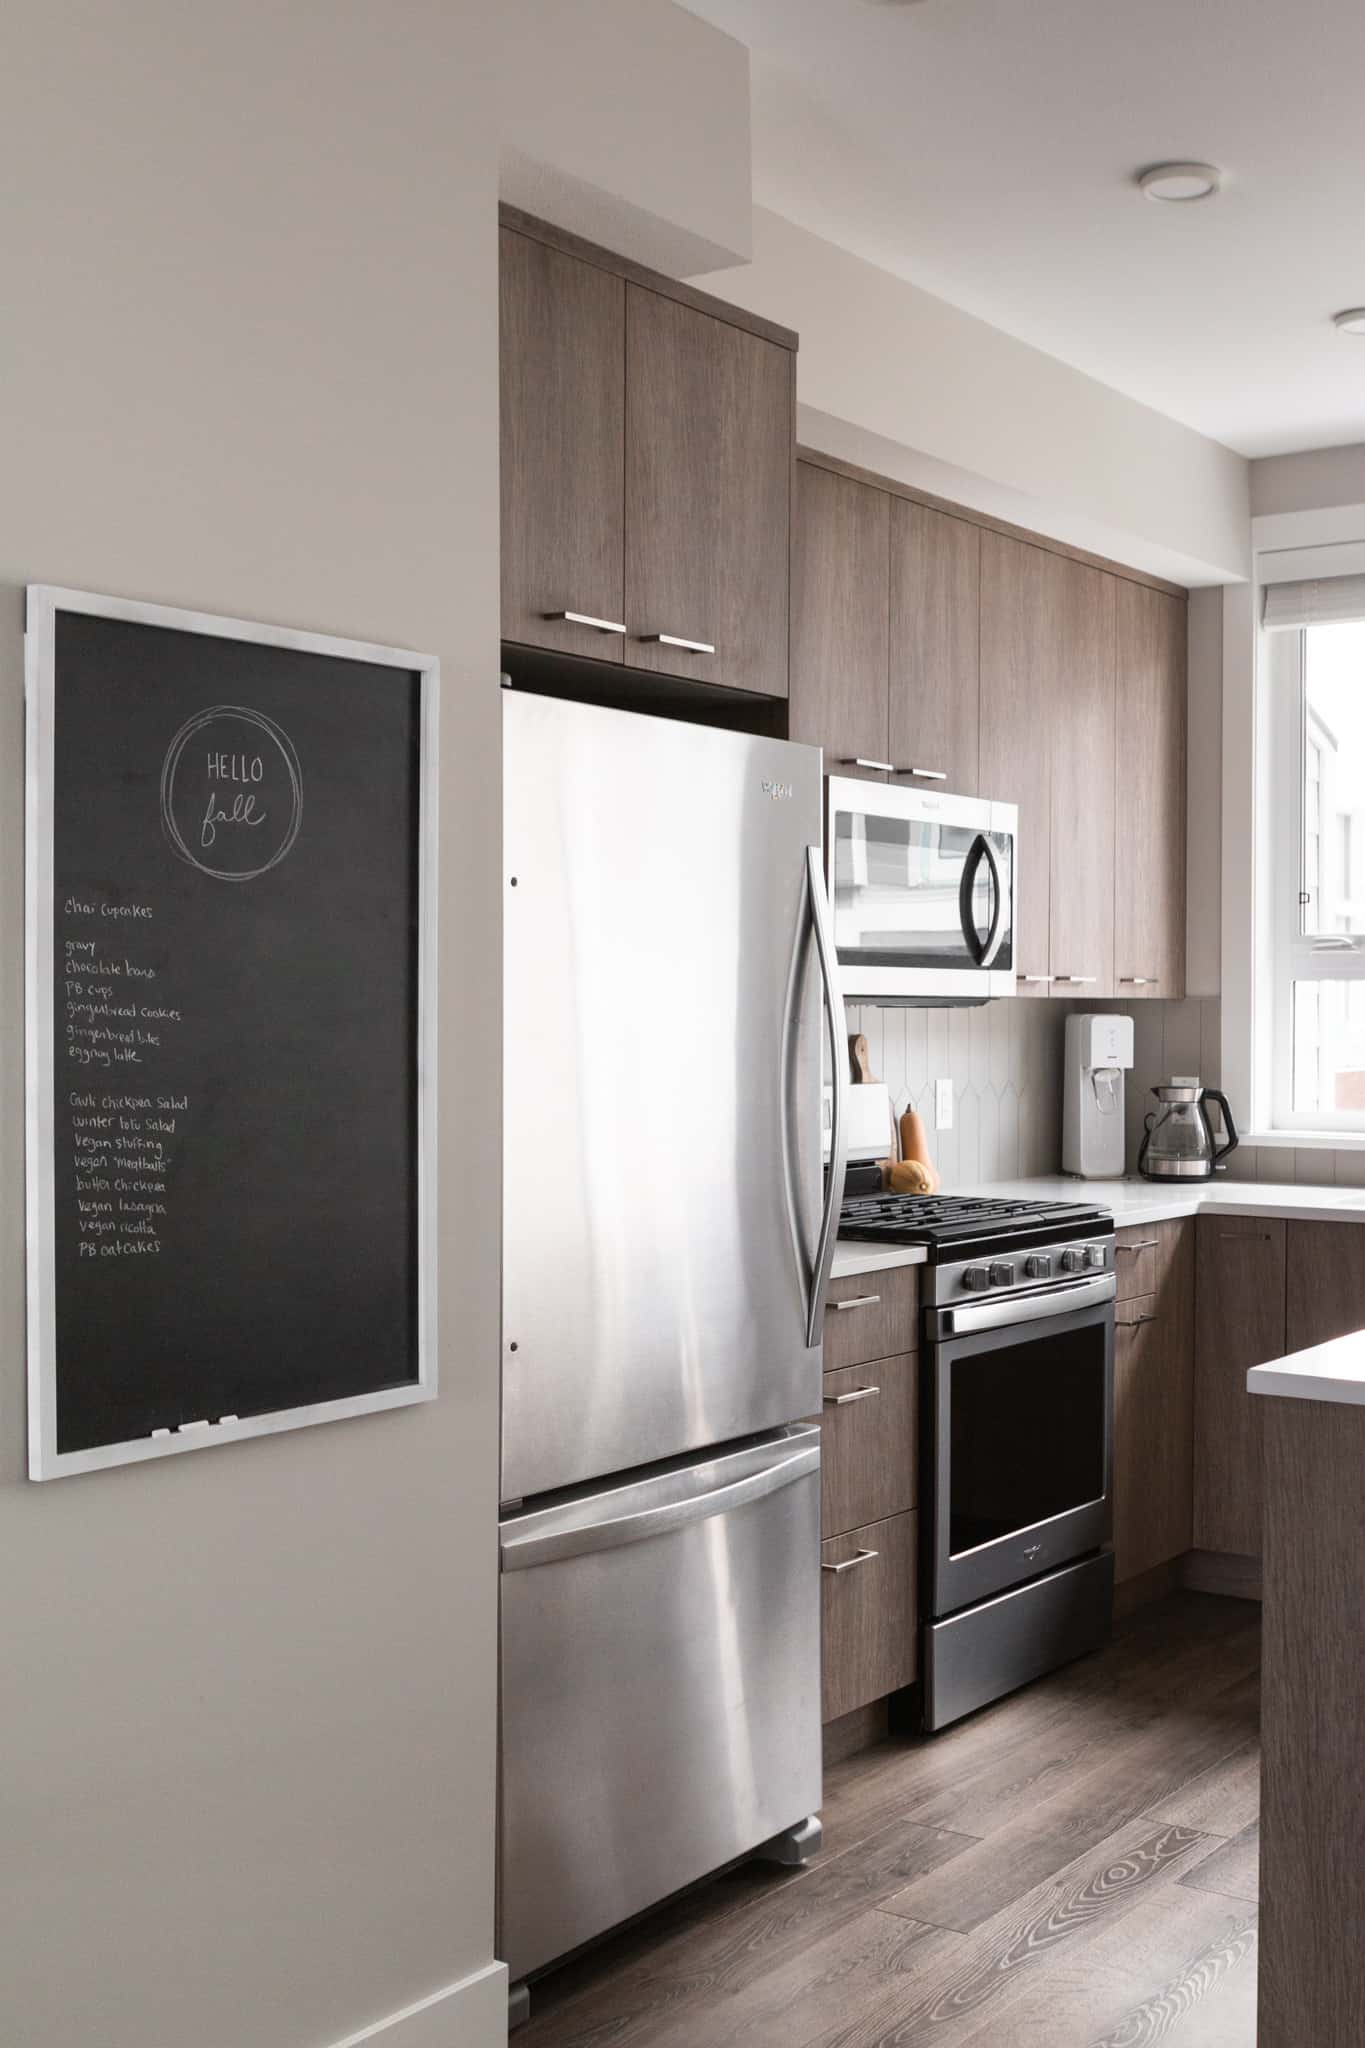 chalkboard and kitchen